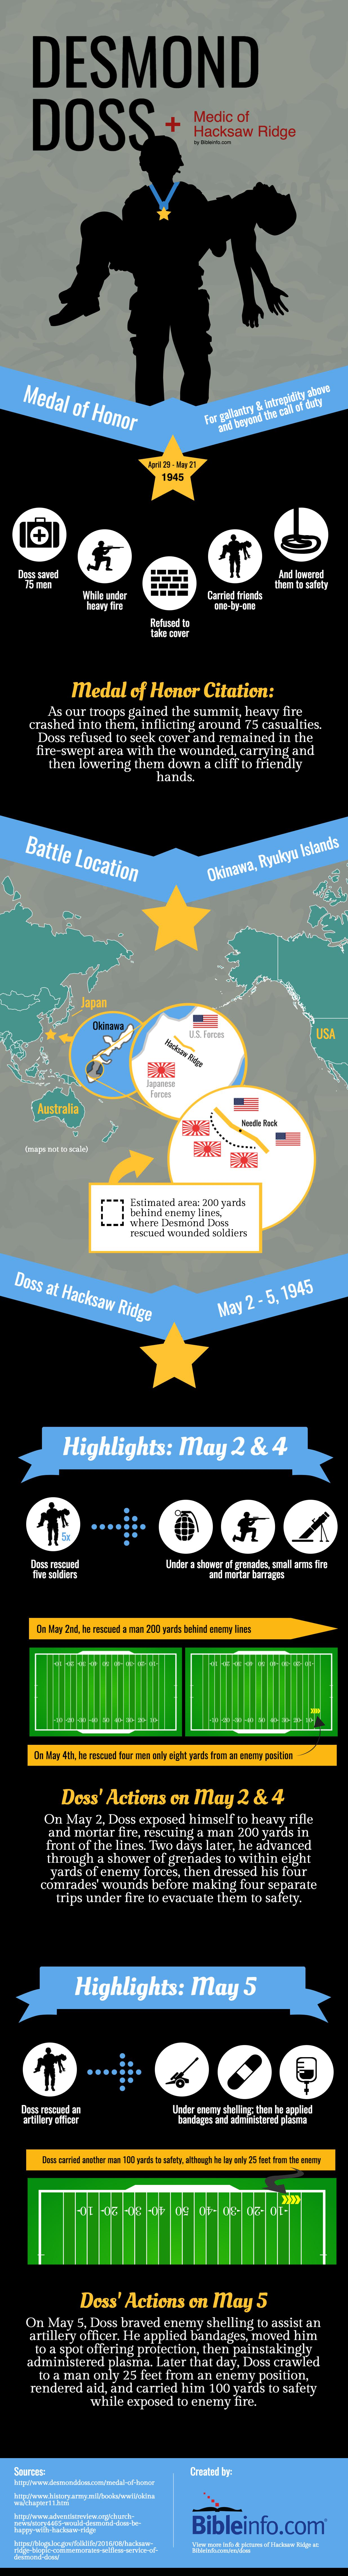 Desmond Doss Infographic